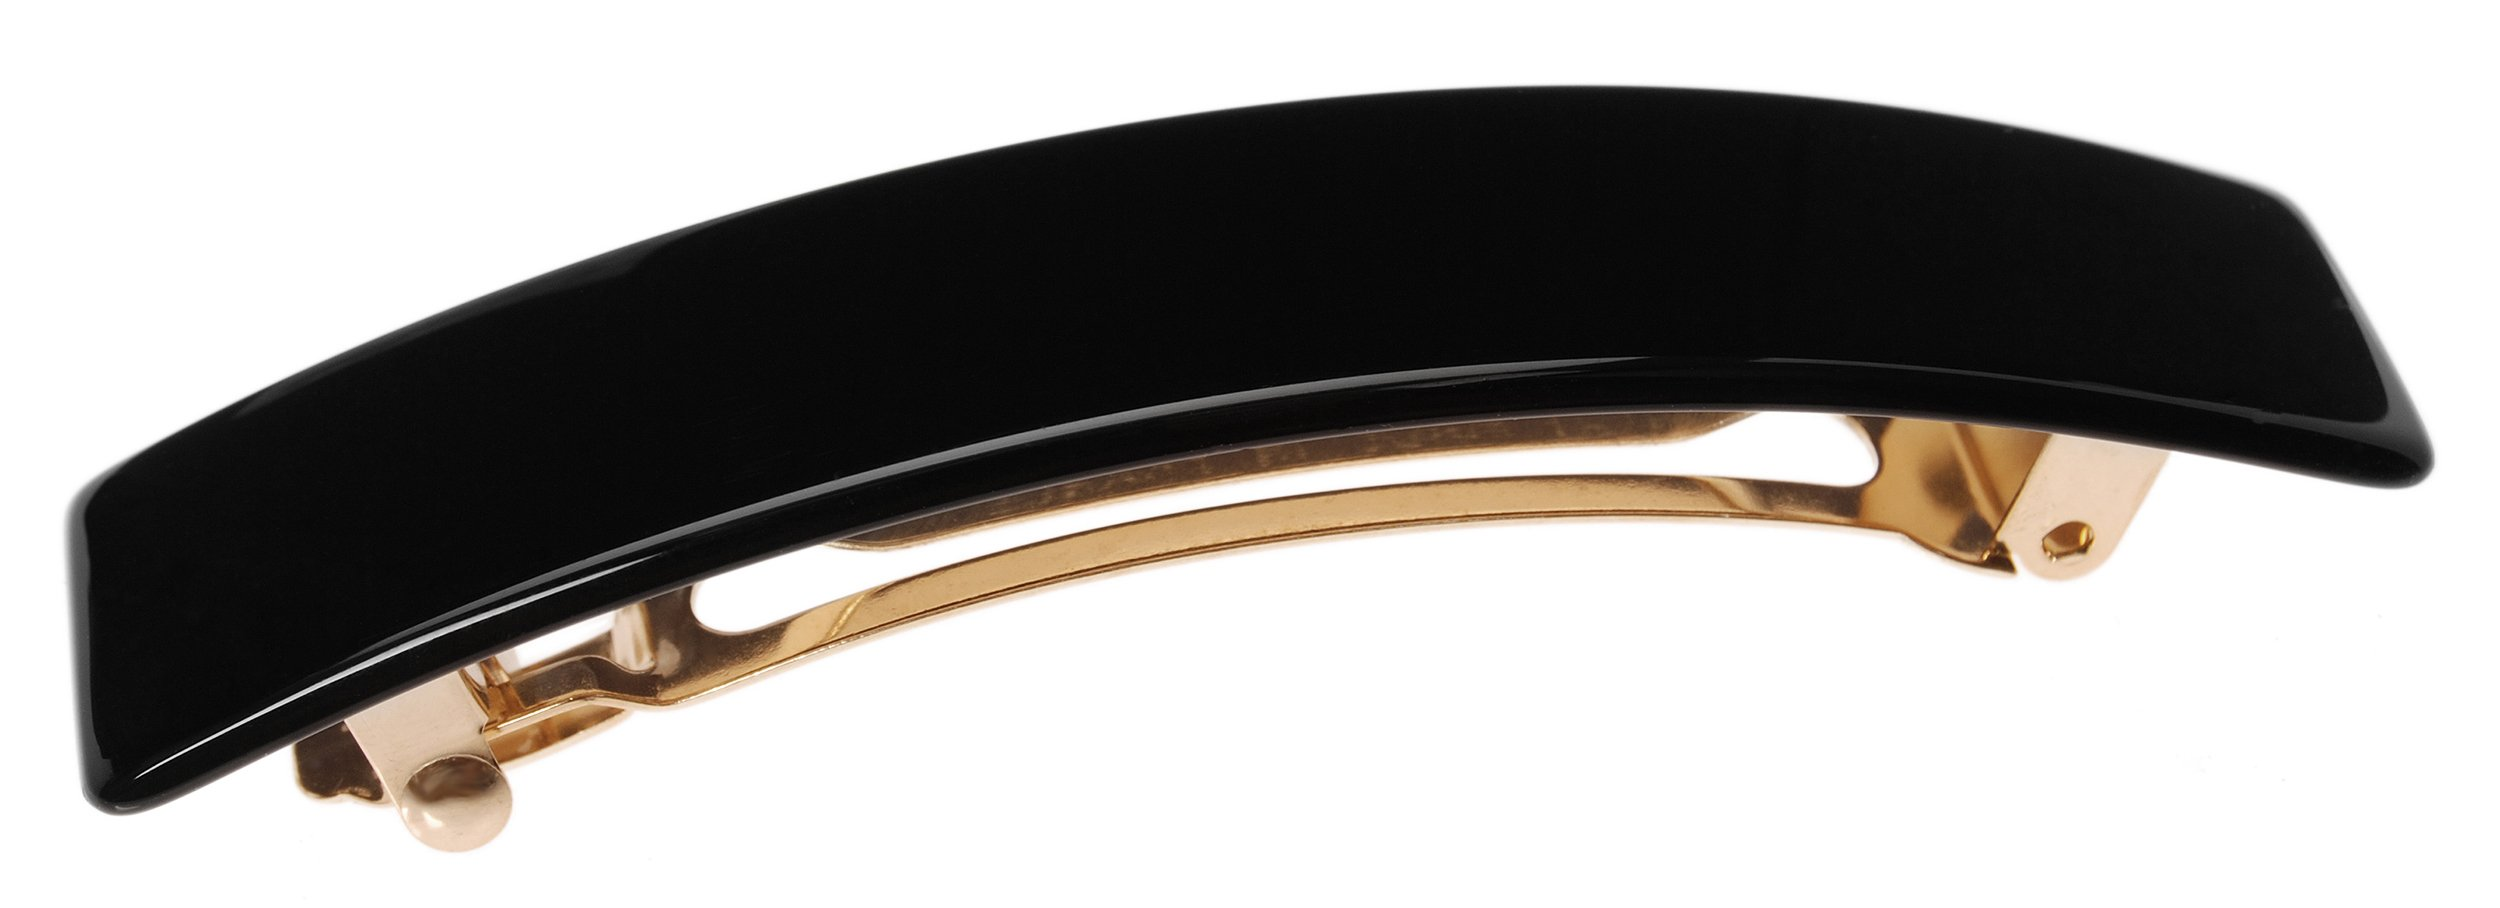 France Luxe Classic Rectangle Barrette - Black